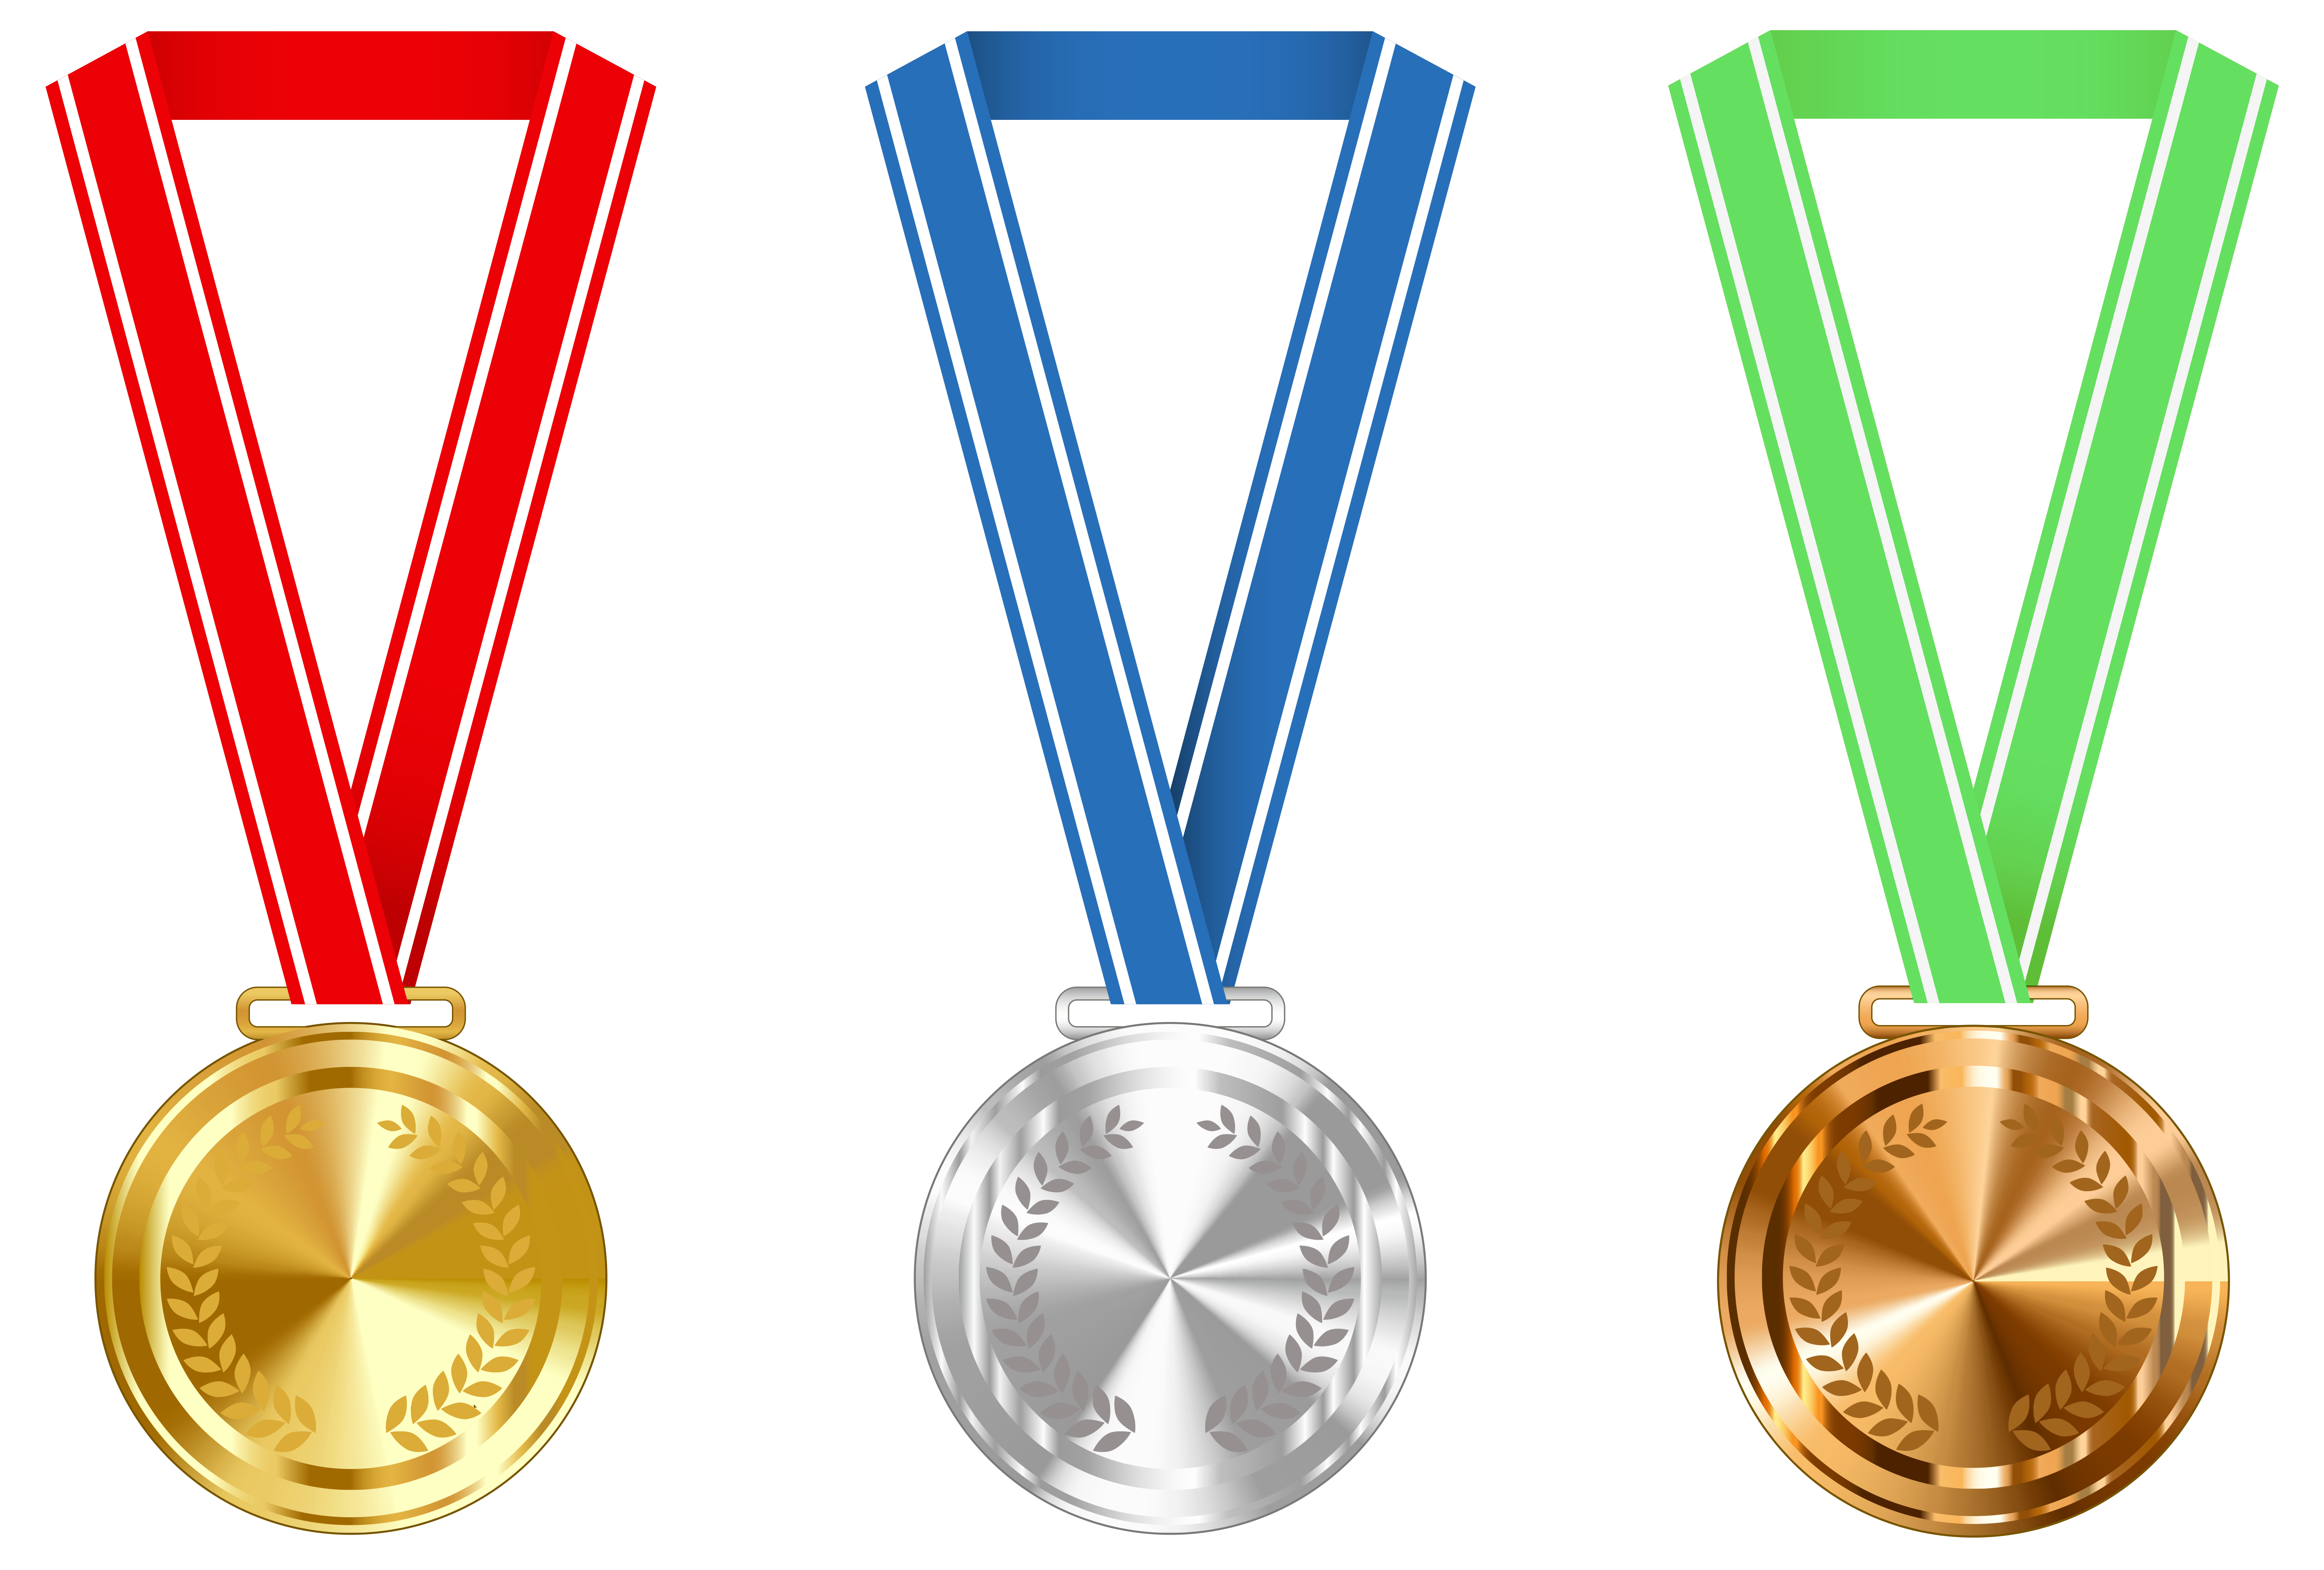 ... Gold Medal Clipart - clip - Gold Medal Clipart